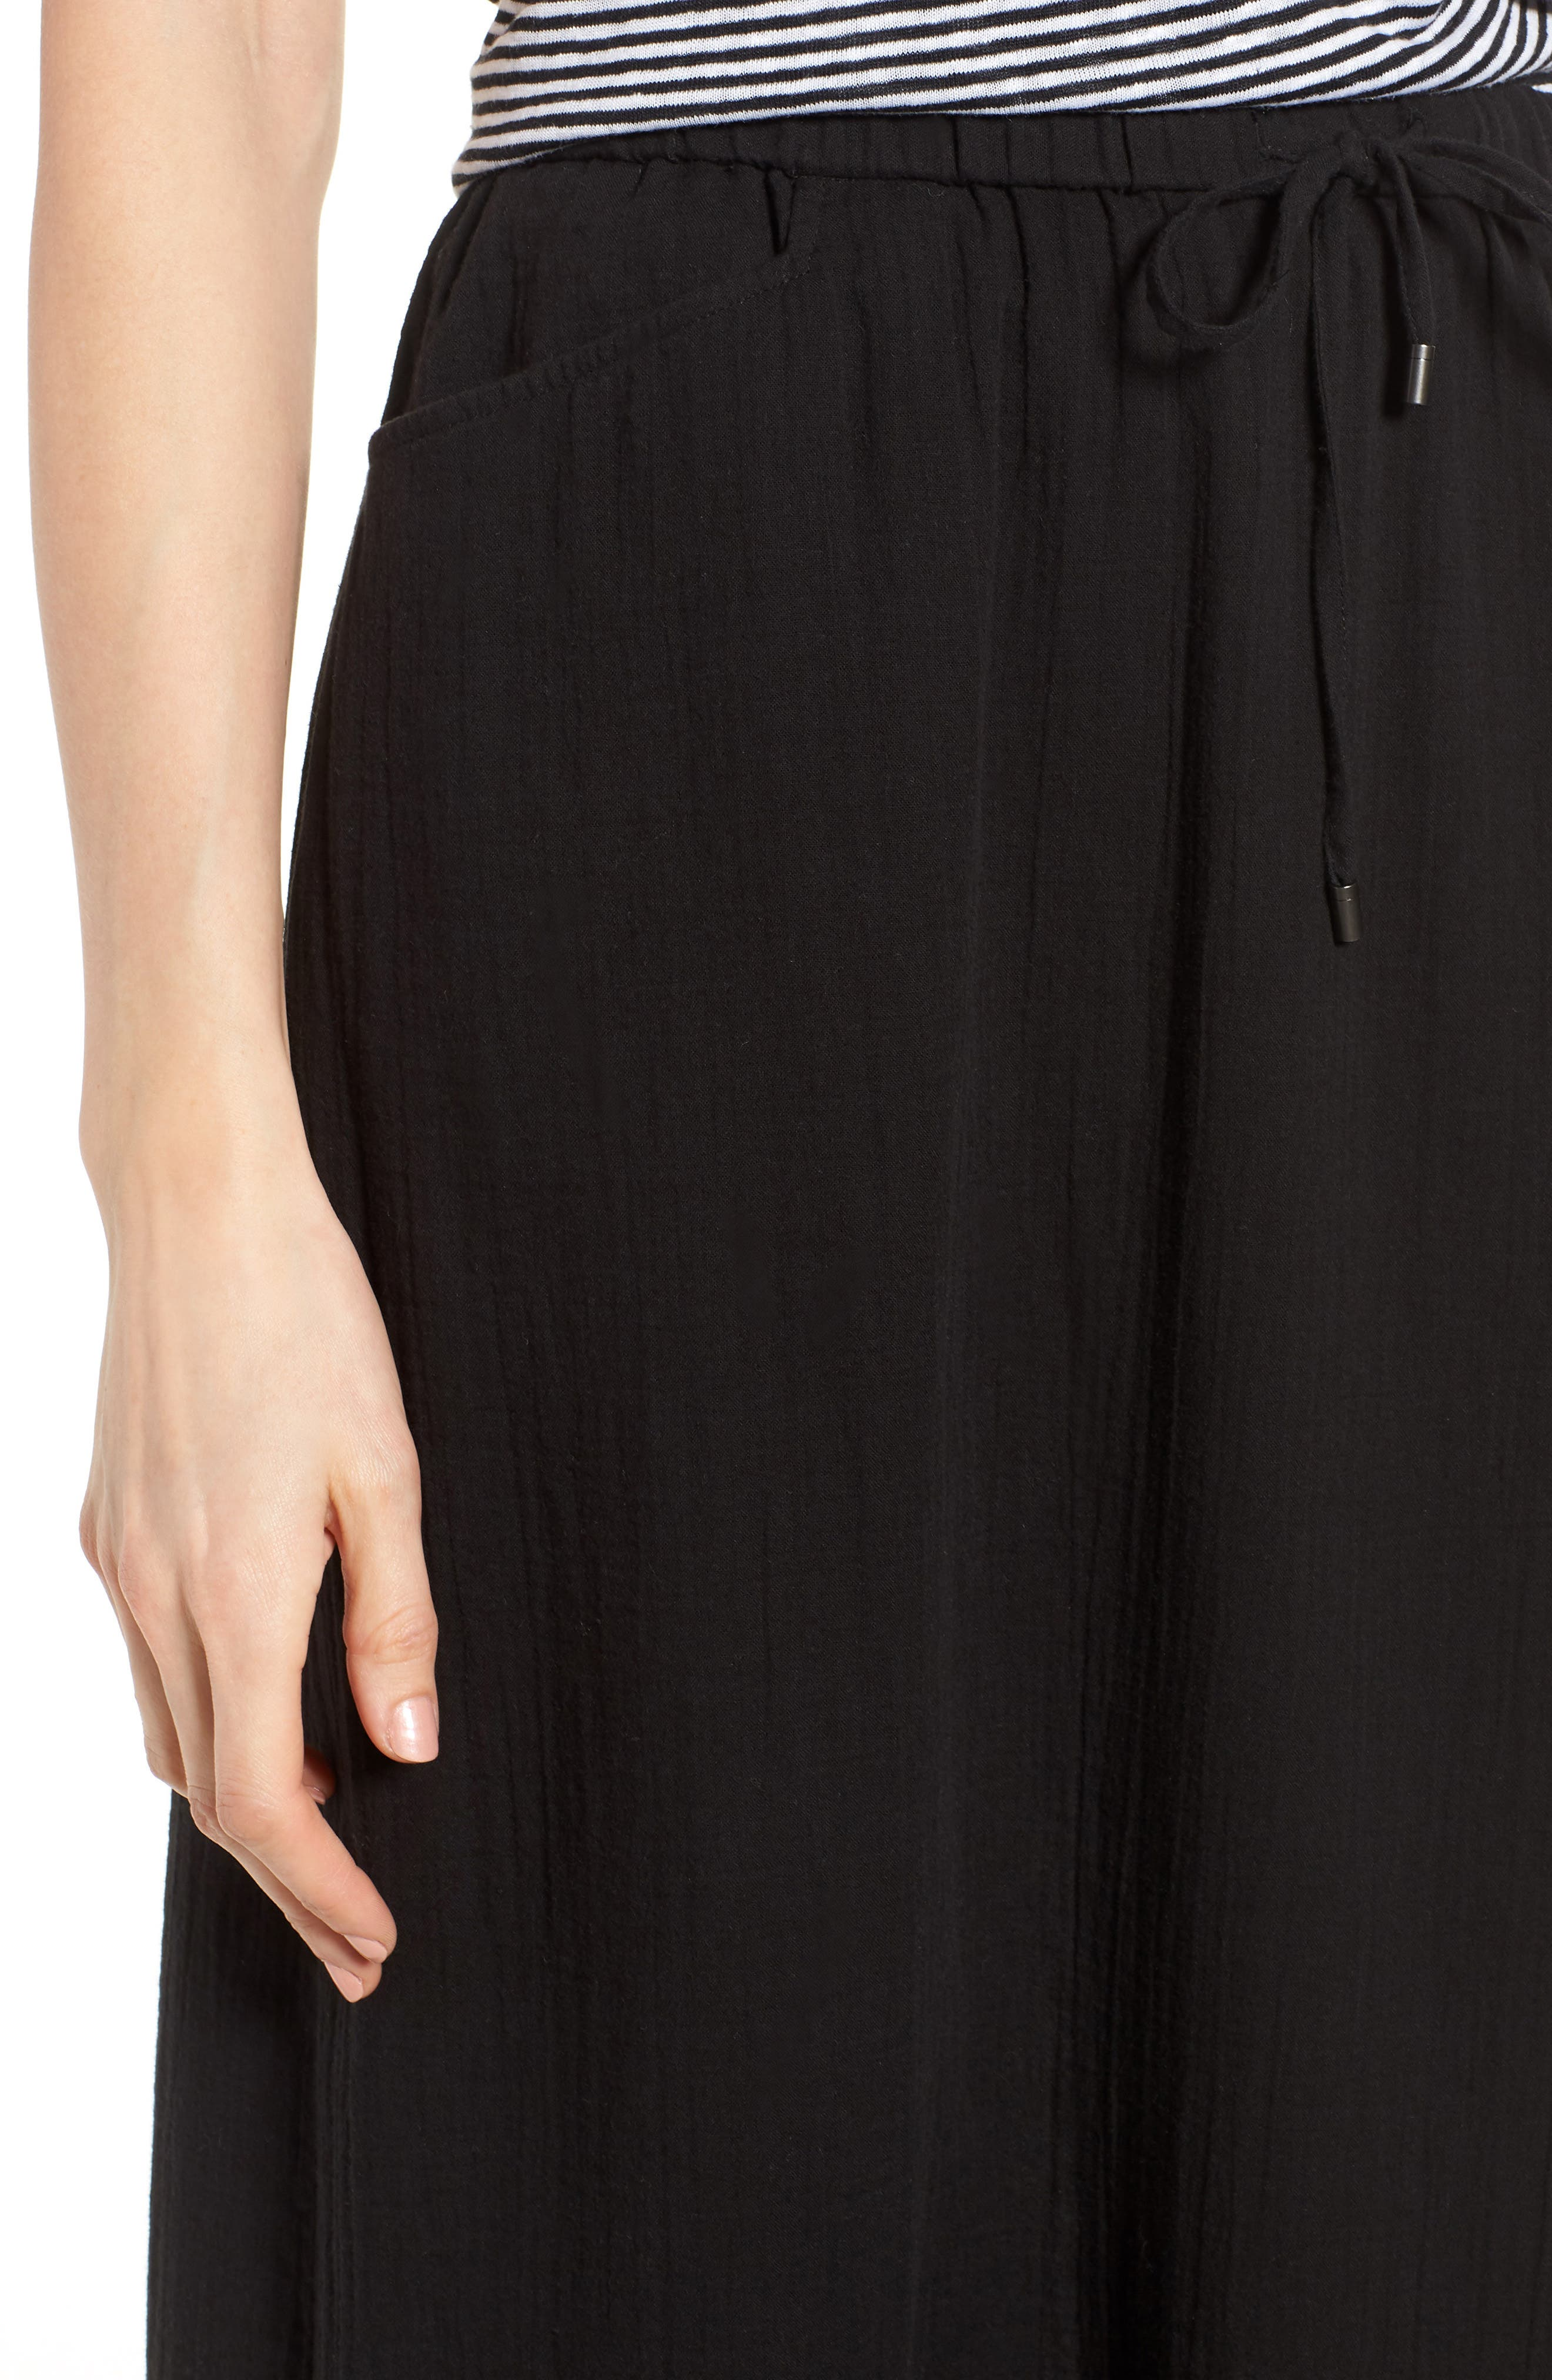 EILEEN FISHER,                             Drawstring Organic Cotton Midi Skirt,                             Alternate thumbnail 4, color,                             001